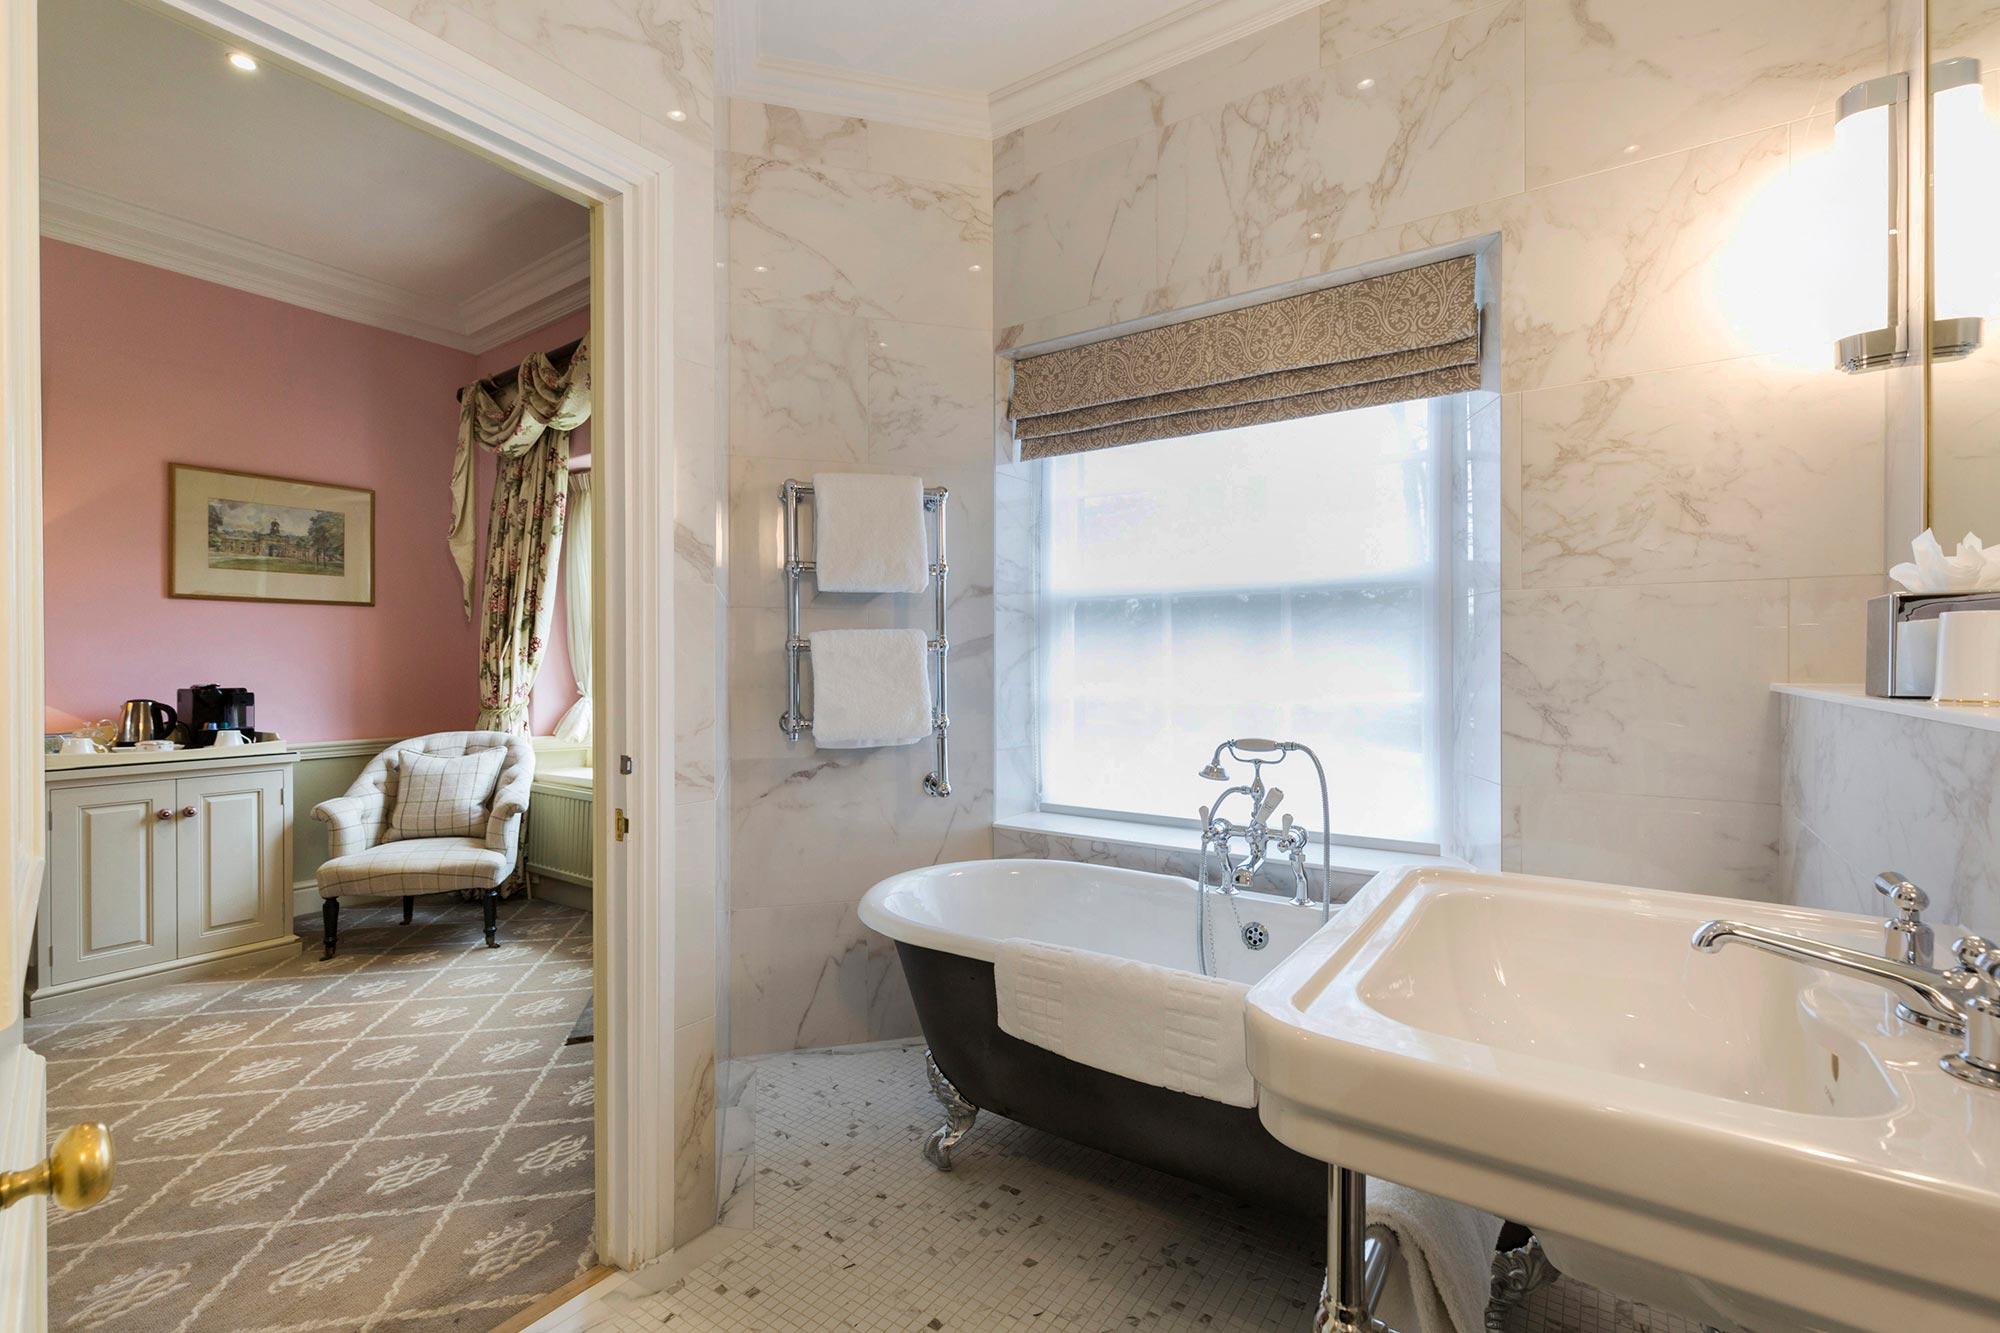 RECOMPOSE-Devonshire-Arms-Bolton-Abbey-Bathroom-refurb-(4)